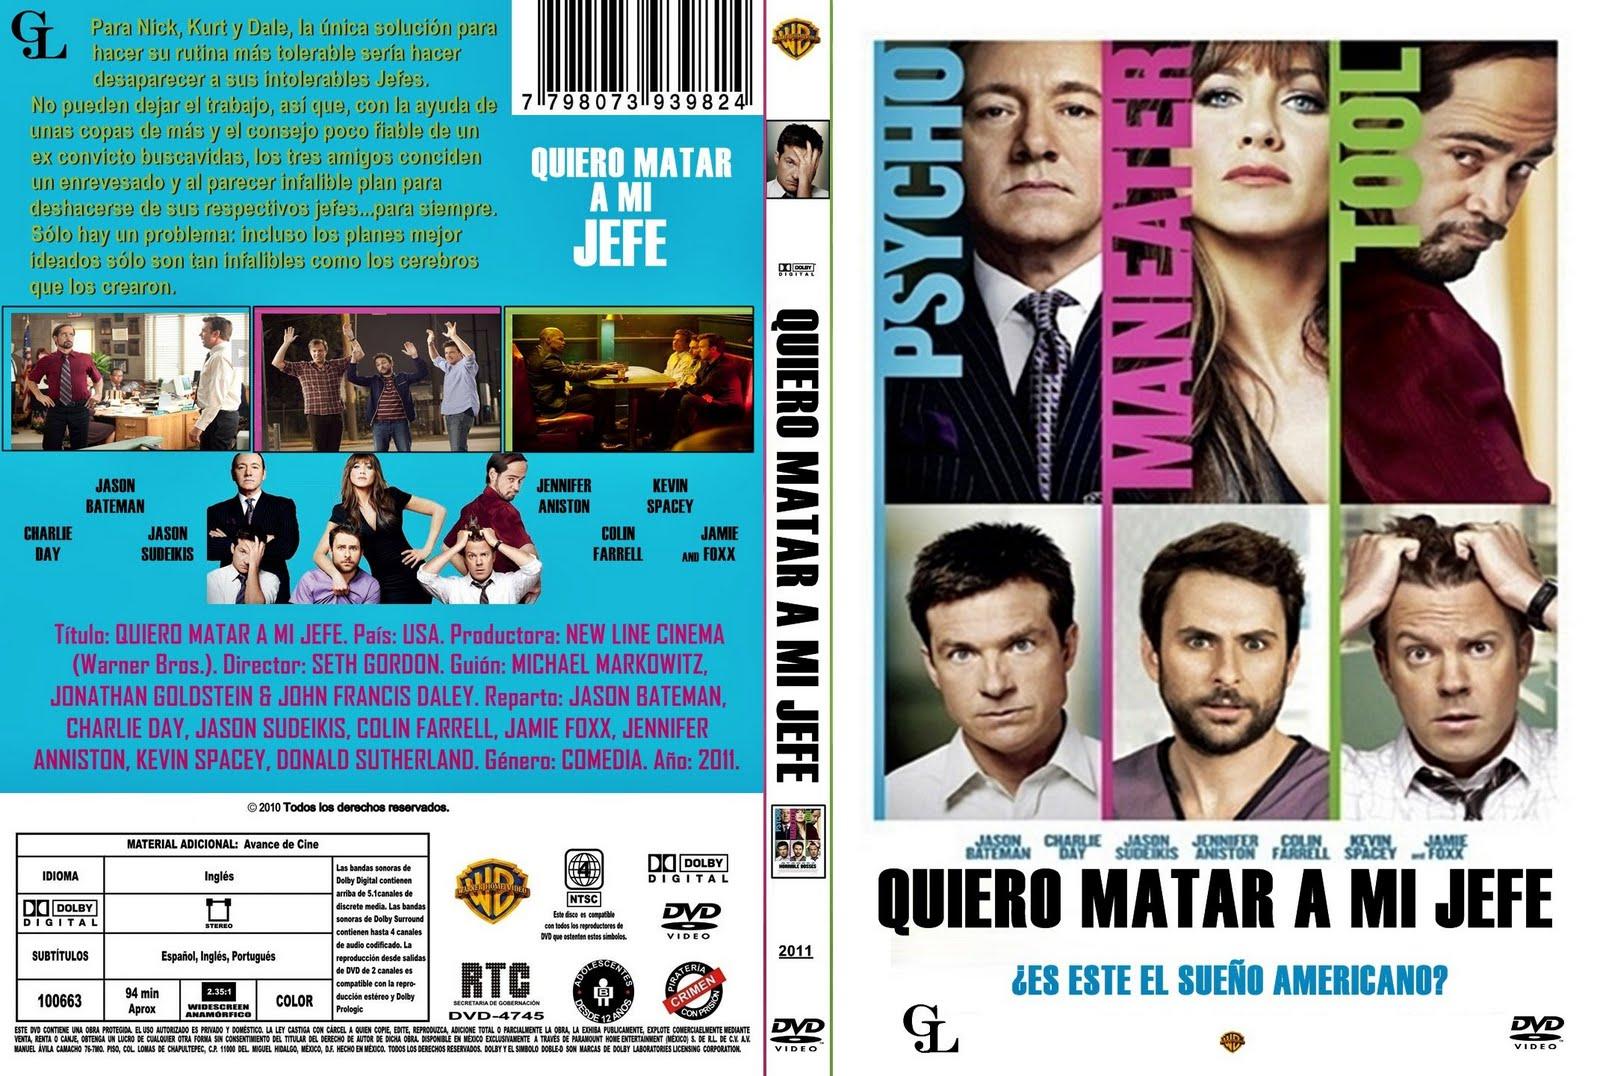 http://1.bp.blogspot.com/-oMQXWLP1_K8/Tn_h3itRAwI/AAAAAAAADWc/CVT_GvbpemQ/s1600/Quiero_Matar_A_Mi_Jefe_-_Custom_por_almirantebron_%255Bdvd%255D_80.jpg